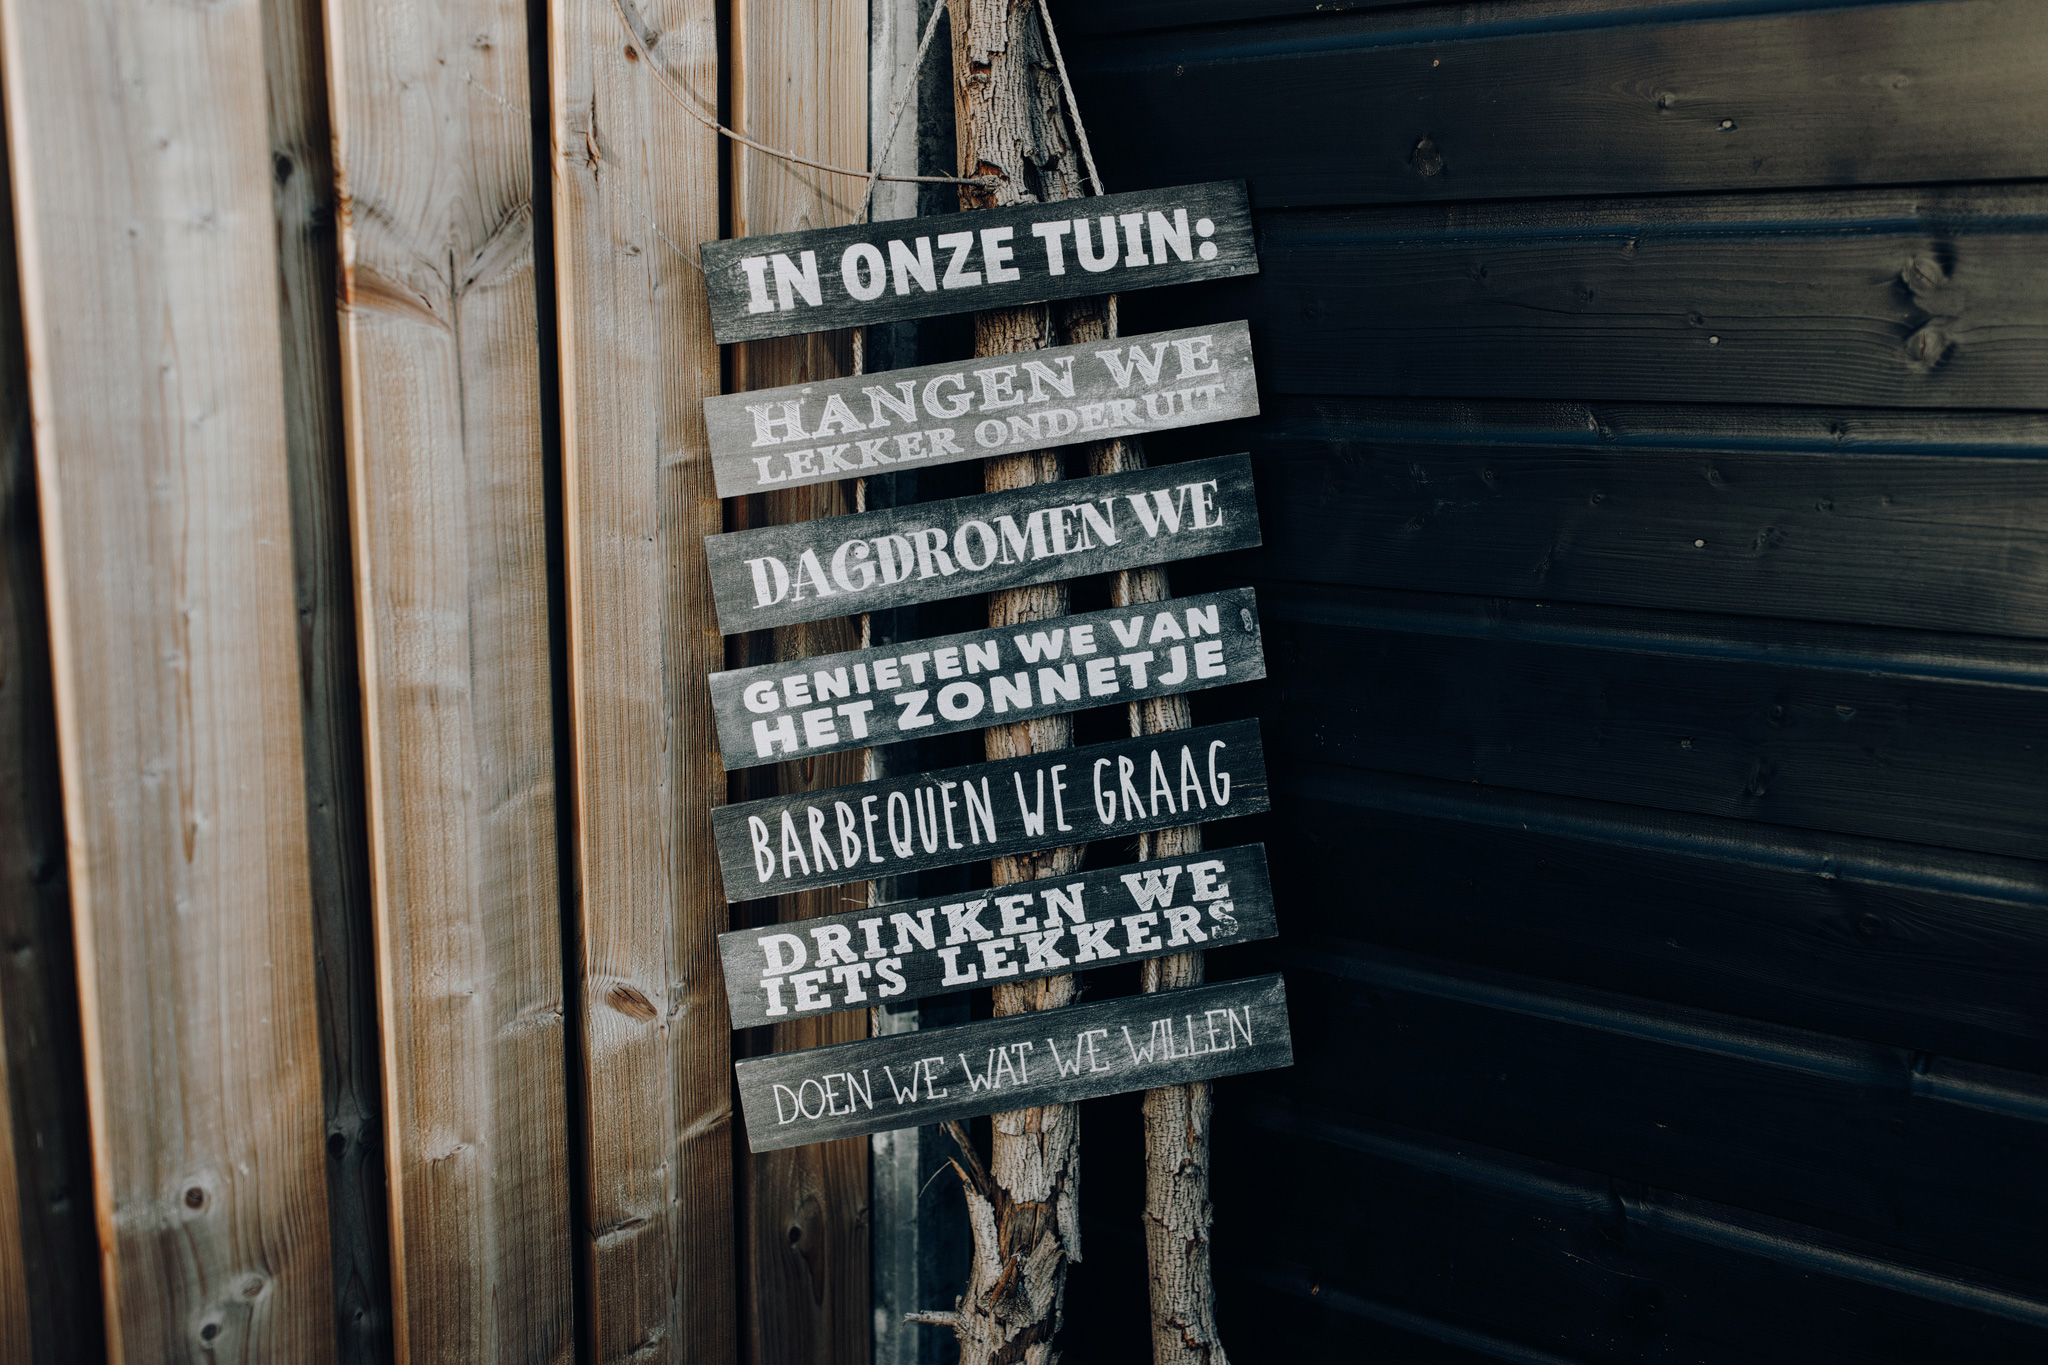 Tekstbord in tuin met regels